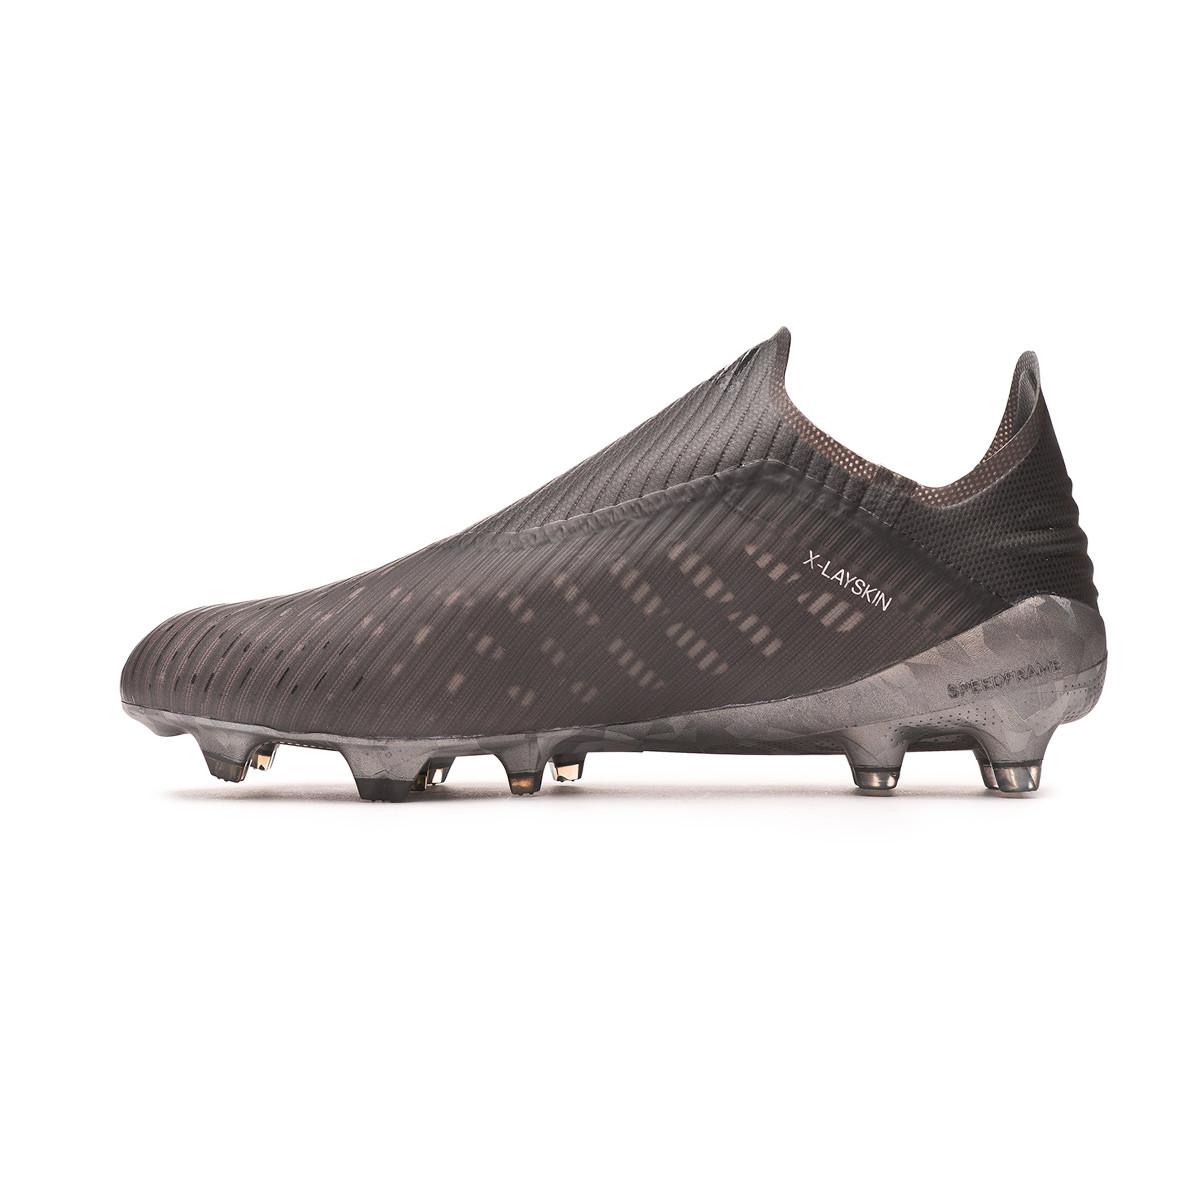 8d6ad6c7a Football Boots adidas X 19+ FG Core black-Utility black-Grey four - Football  store Fútbol Emotion